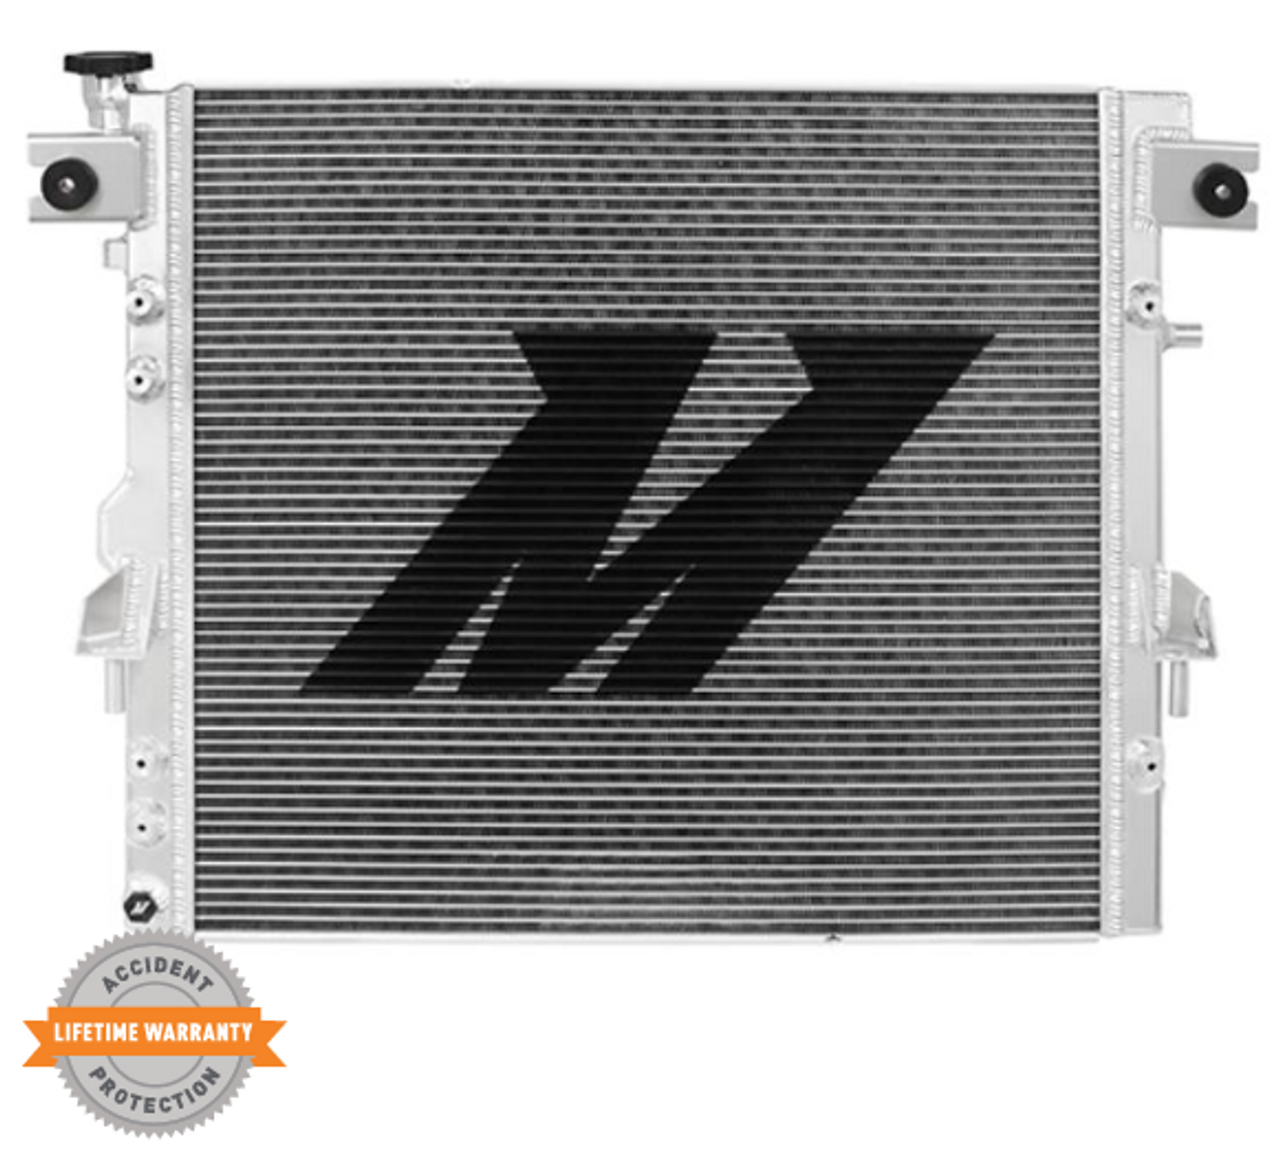 Mishimoto MMRAD-WRA-07V2 Performance Aluminum Radiator for Jeep Wrangler JK 2007-2018